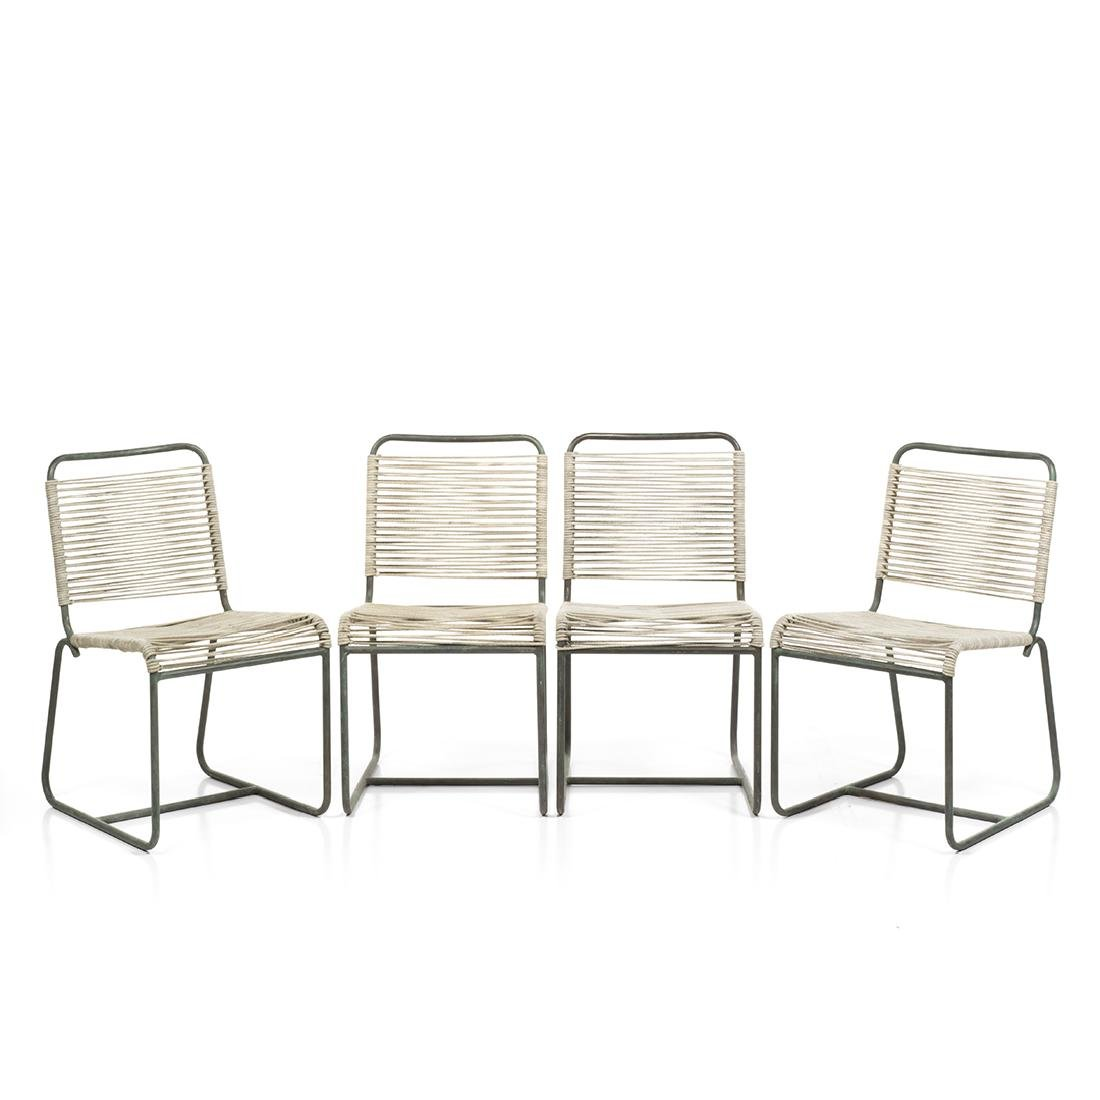 Walter Lamb Dining Chairs (4)